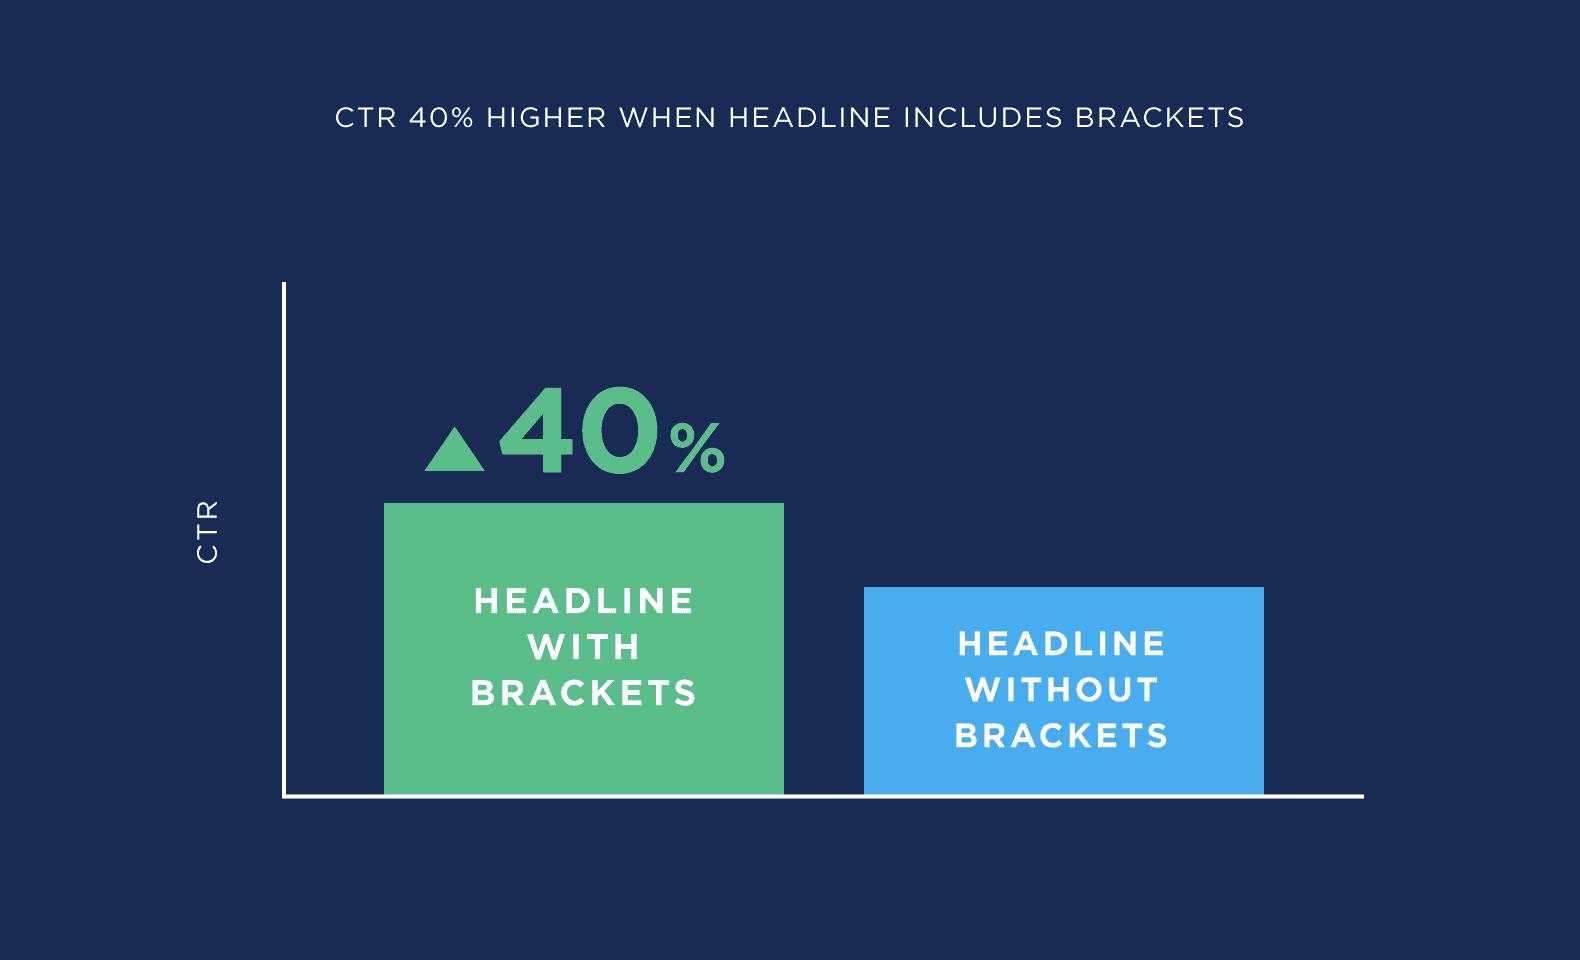 CTR 40% higher when headline includes brackets